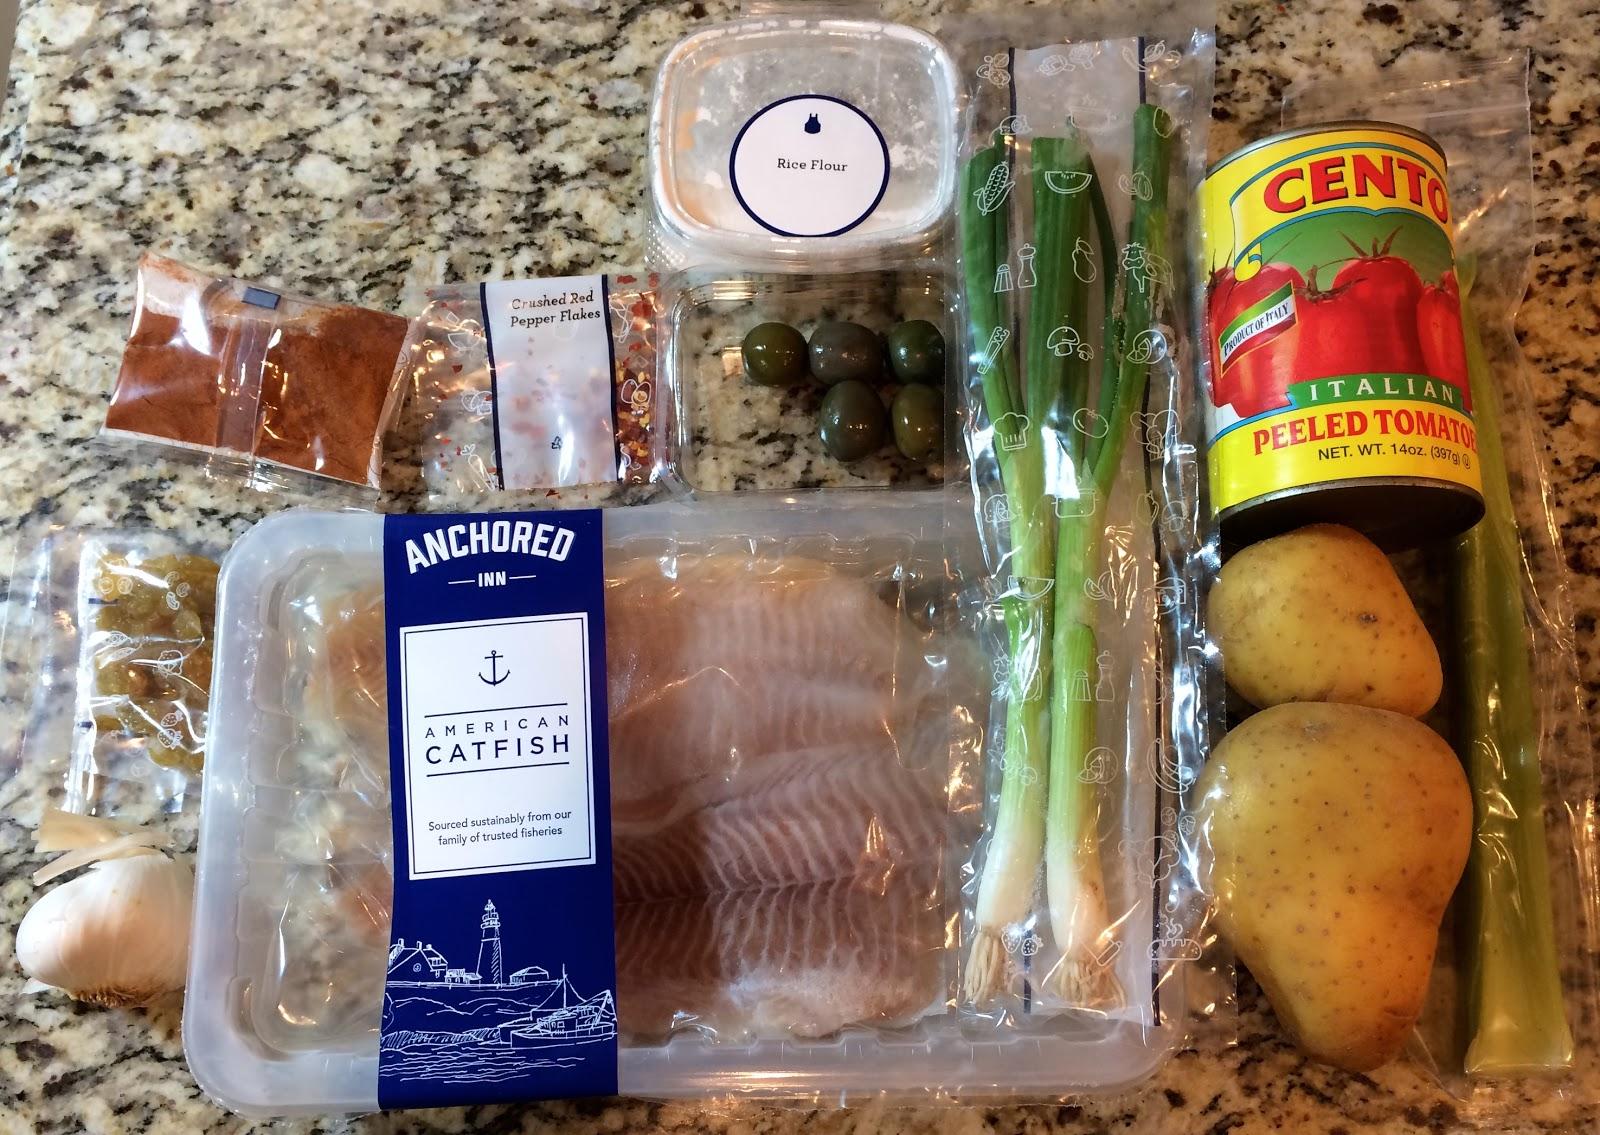 Blue apron wonton noodles - Blackened Catfish With Veracruz Sauce